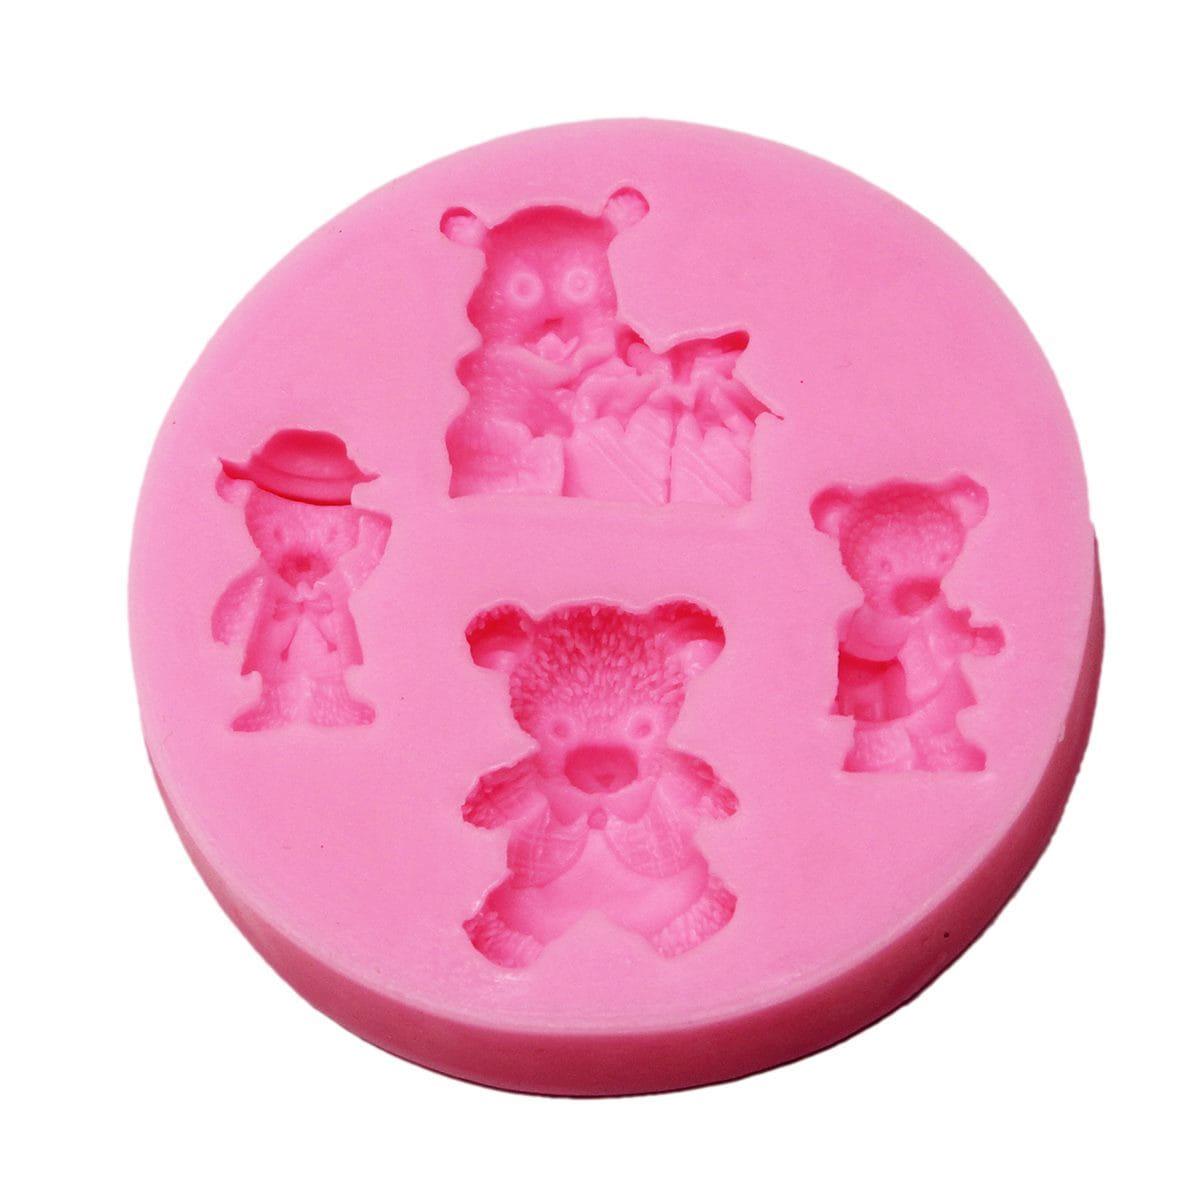 Resin Silicone Mould Miniature Teddy Design